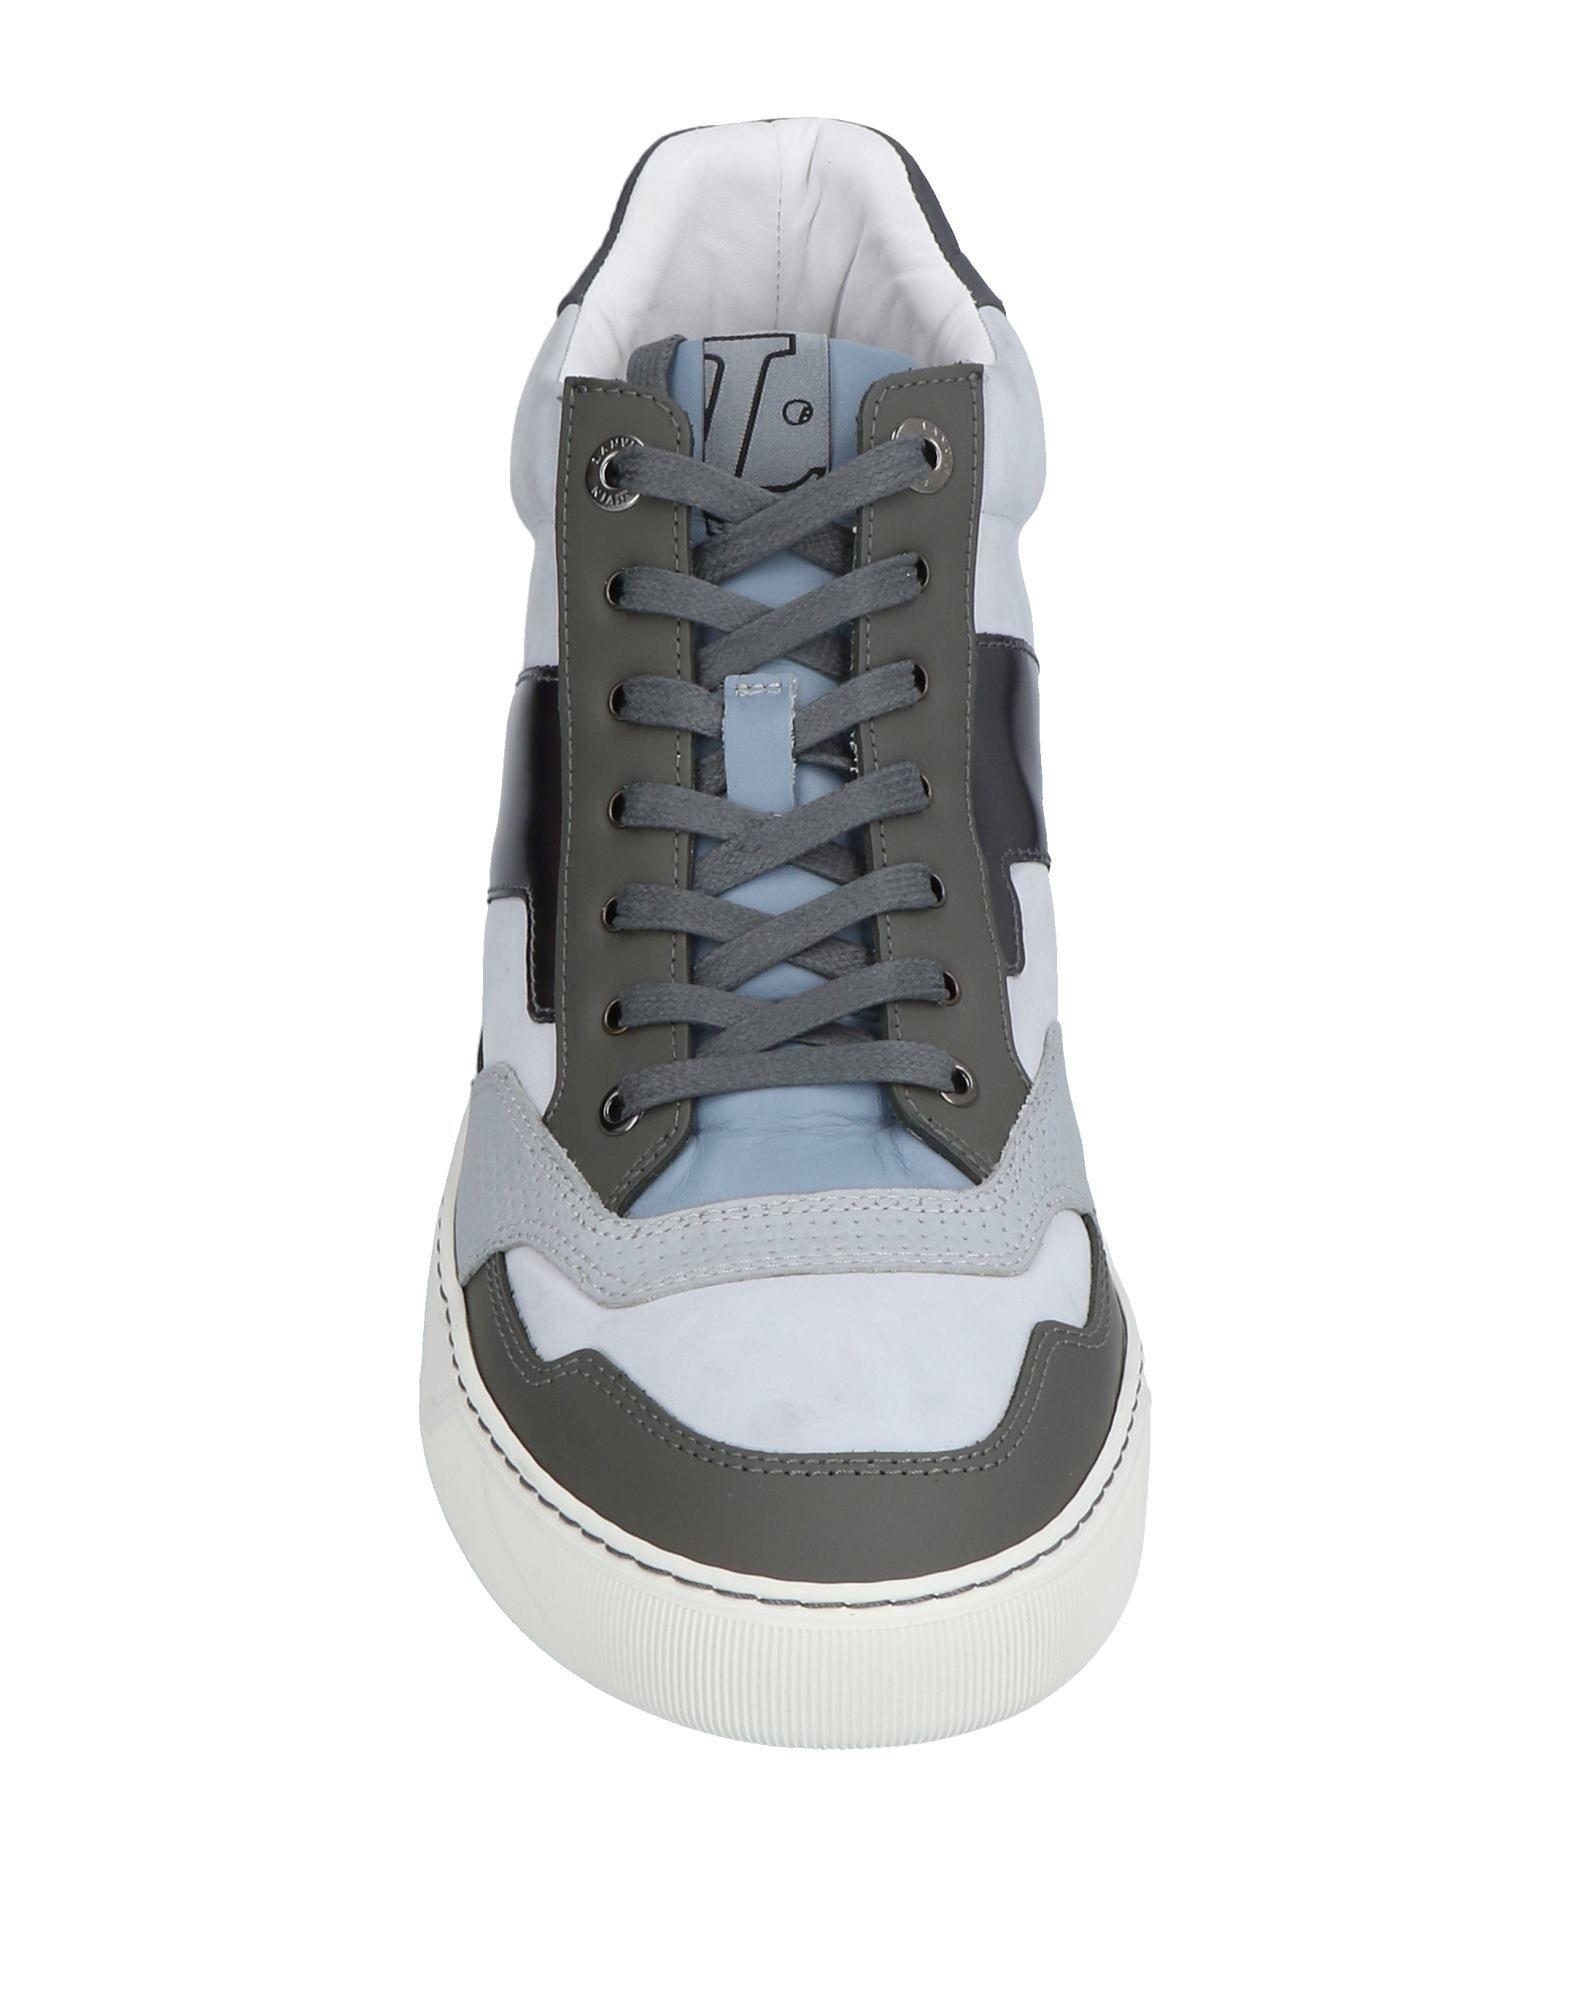 Lanvin Sneakers Herren  11492720BU 11492720BU 11492720BU Gute Qualität beliebte Schuhe c3640b